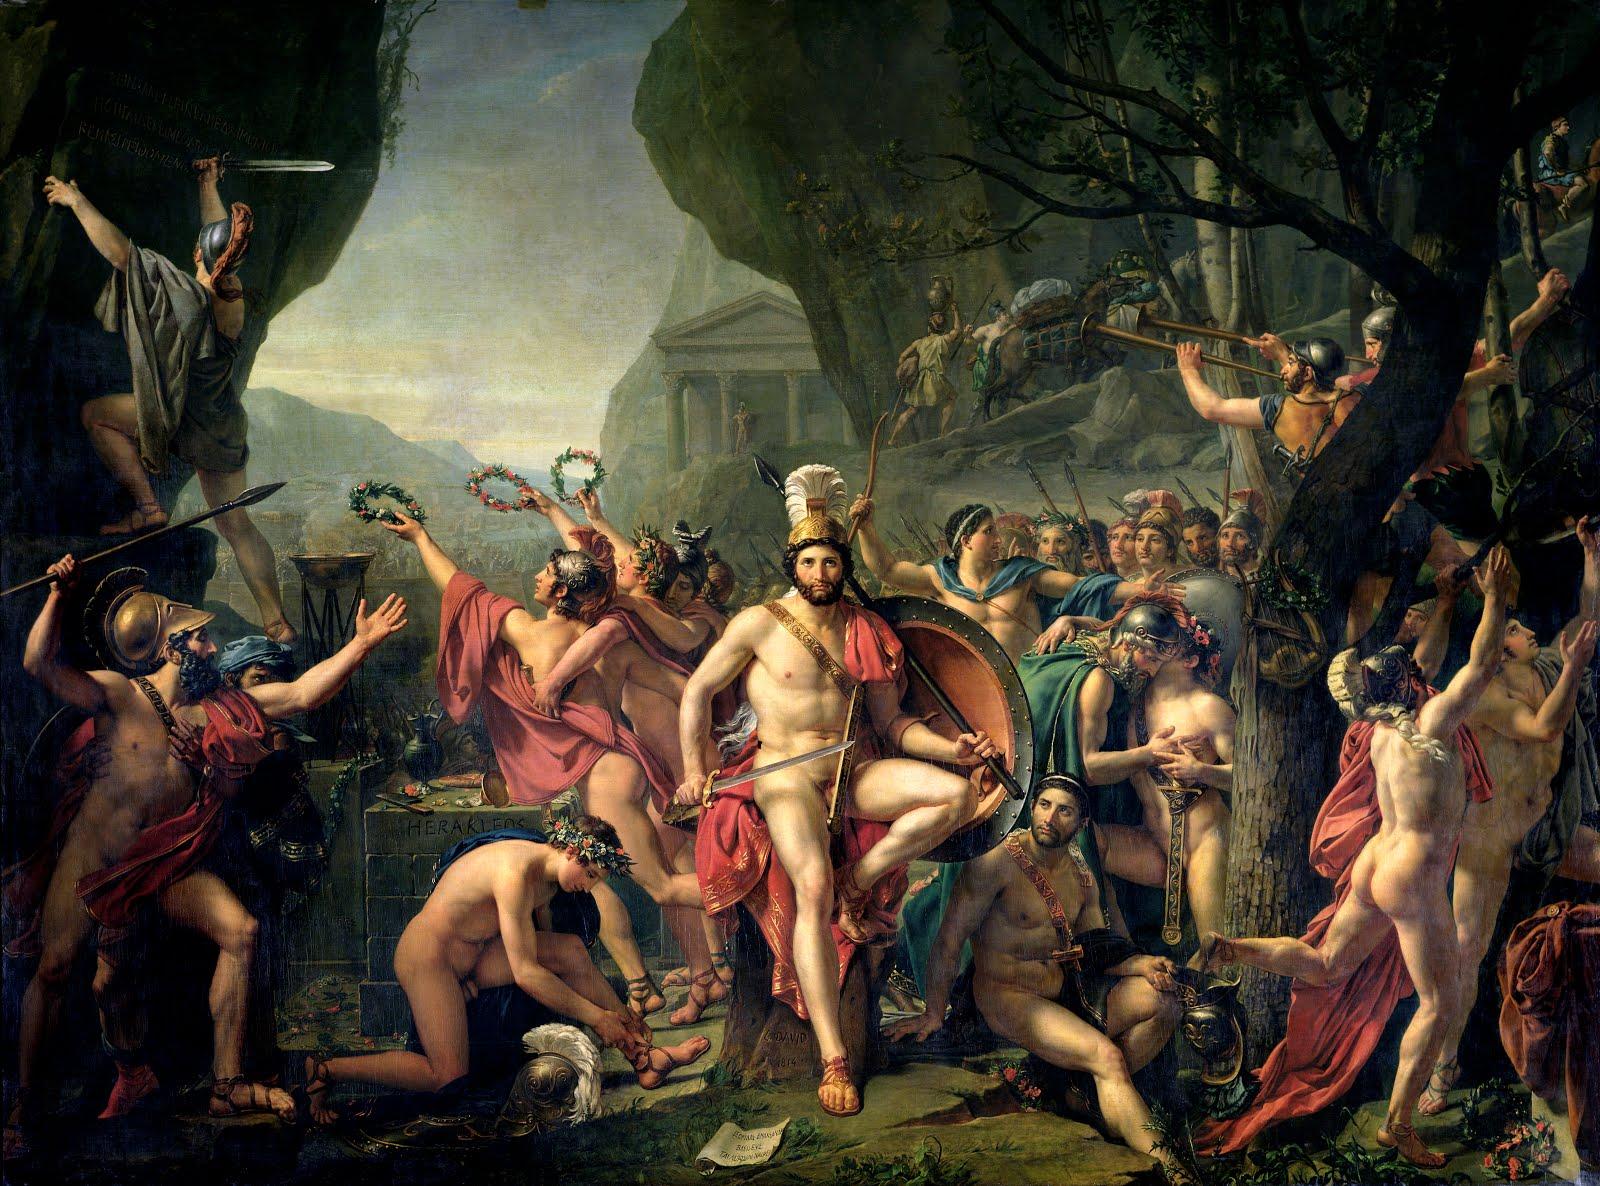 Léonida alle Termopili di Jacques-Louis David